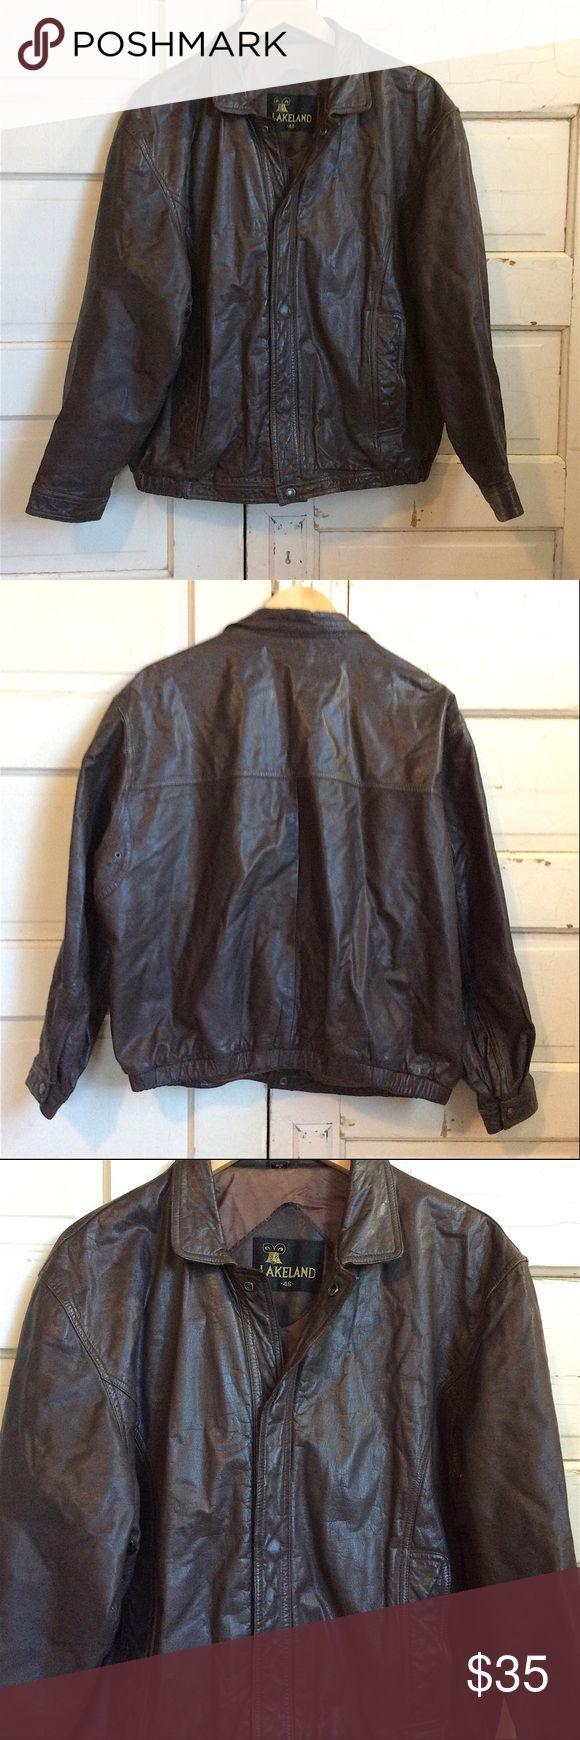 Men's Vintage Lakeland Leather Bomber Jacket Bomber